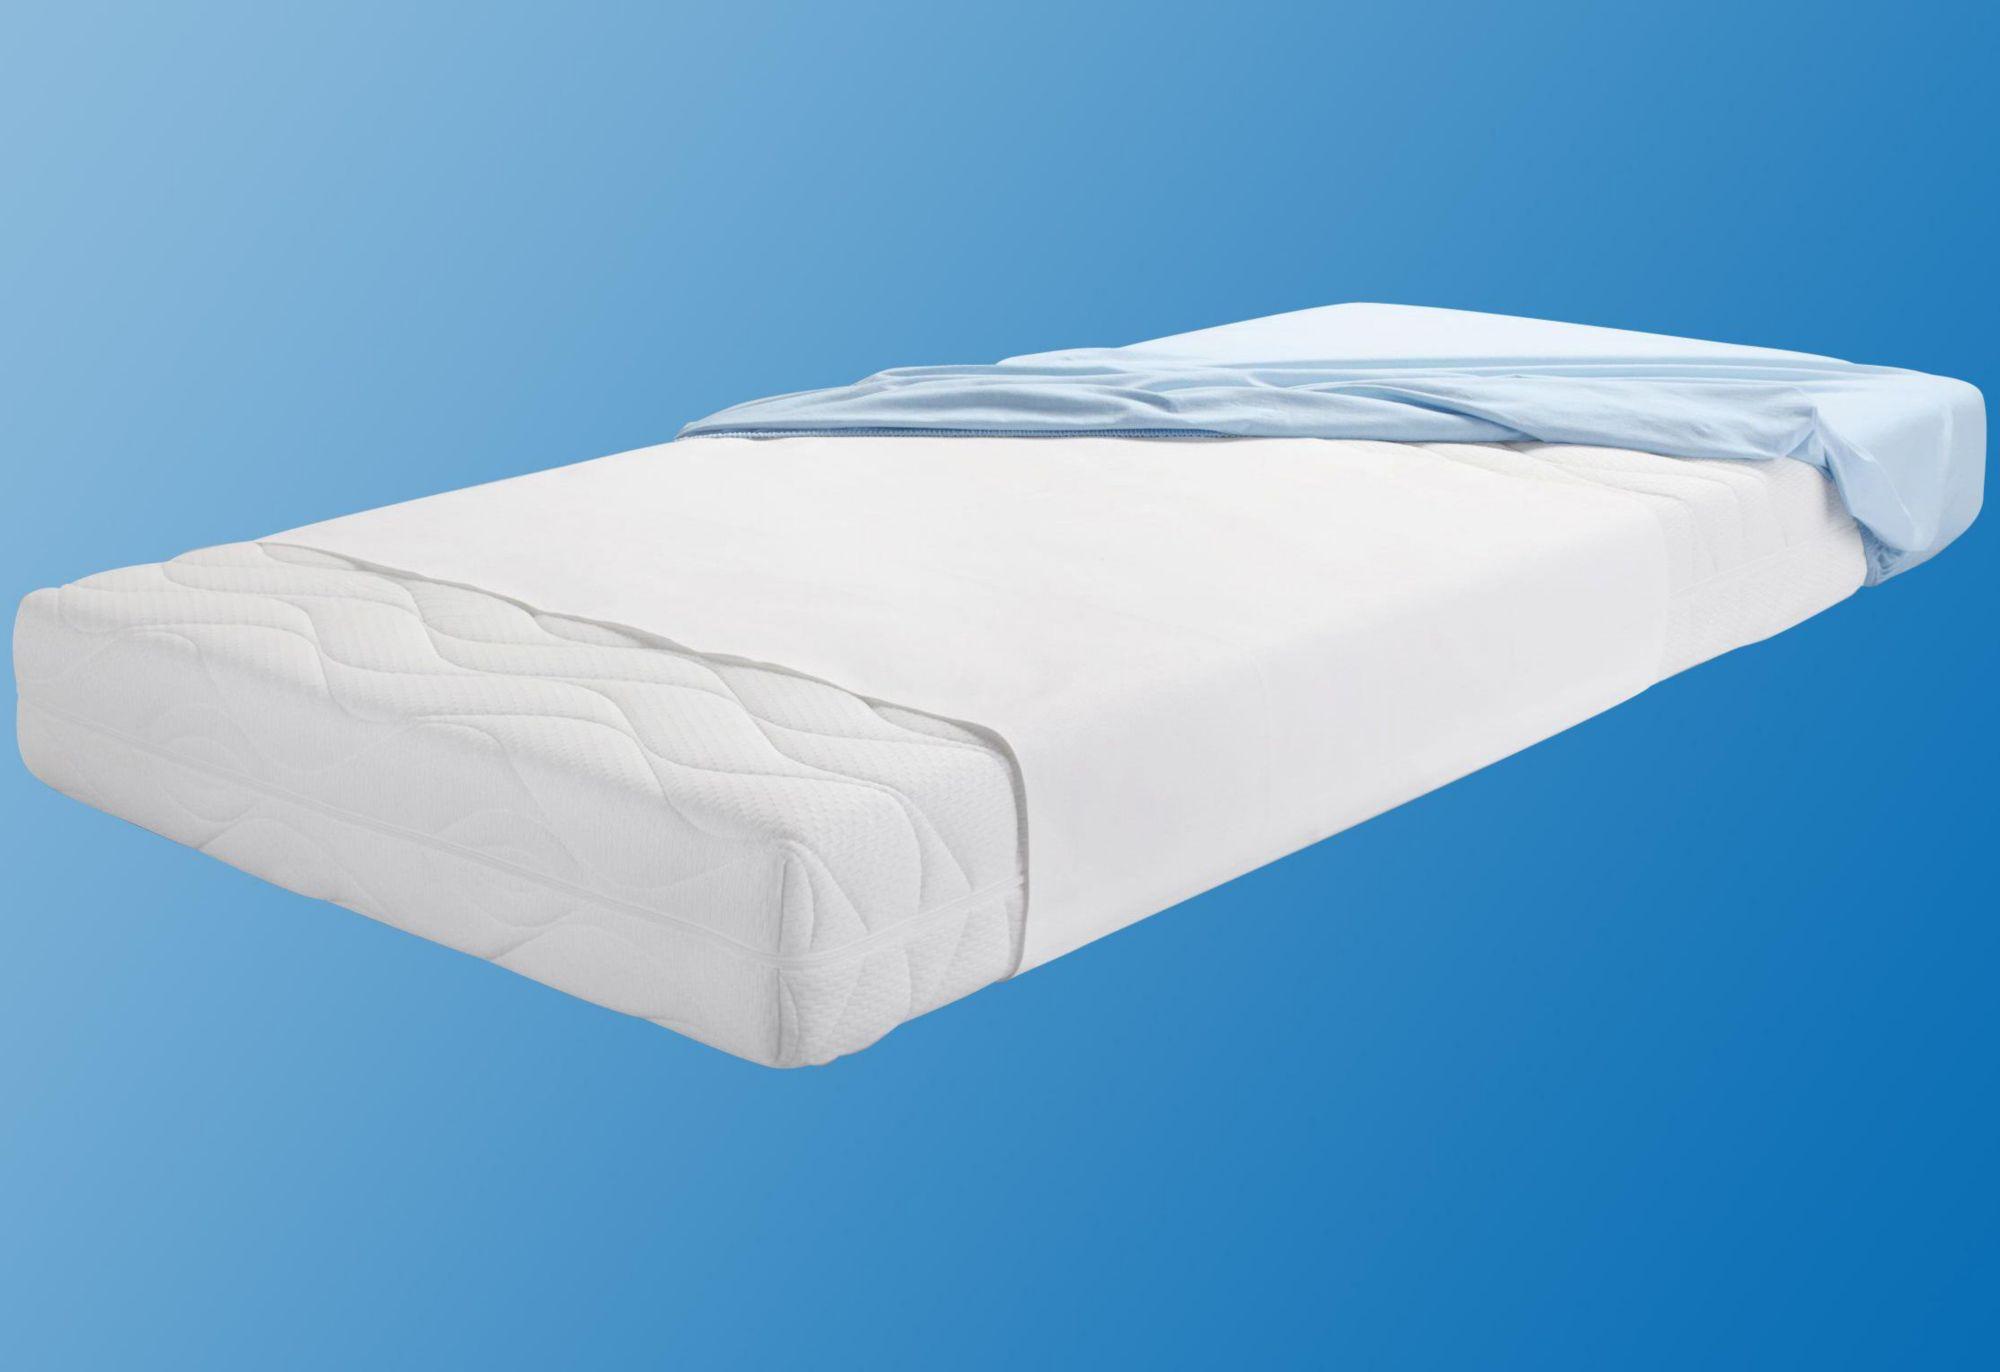 DORMISETTE Inkontinenzauflage, »Dormisette Protect & Care wasserdichte Matratzenauflage«, Dormisette